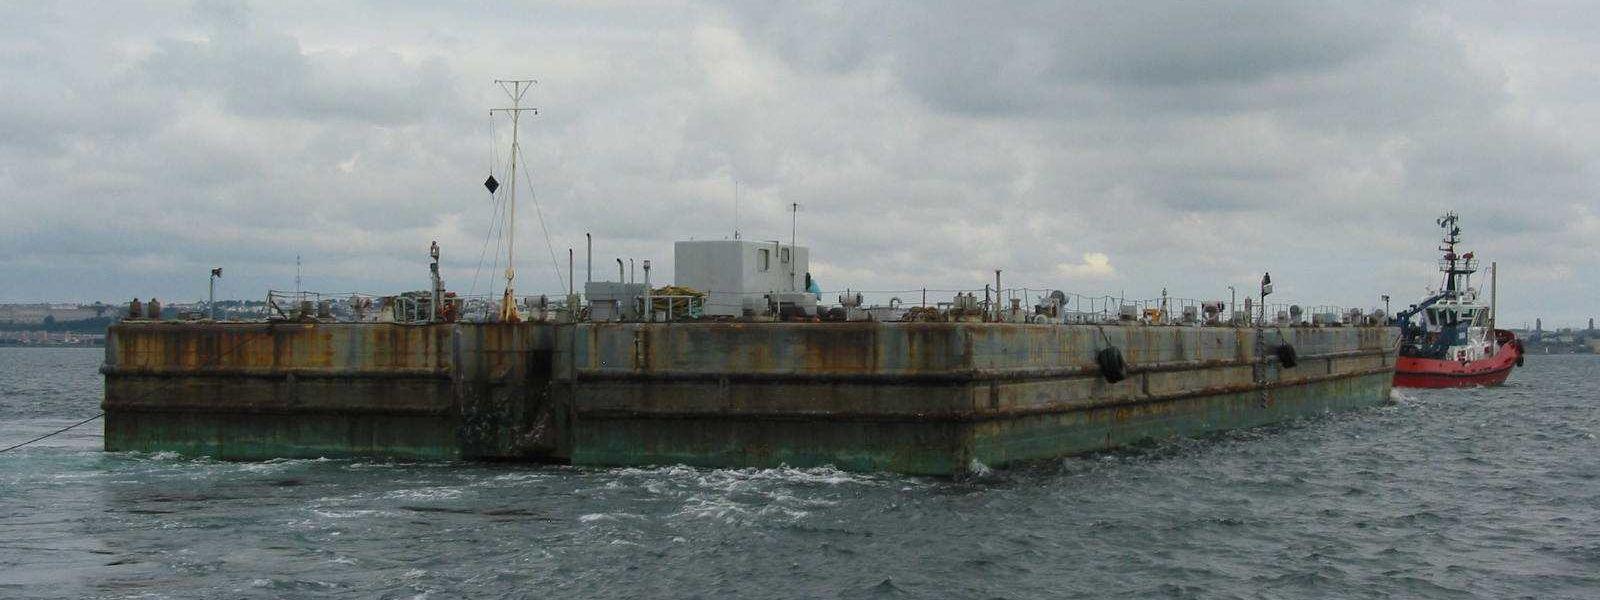 La barge dating site